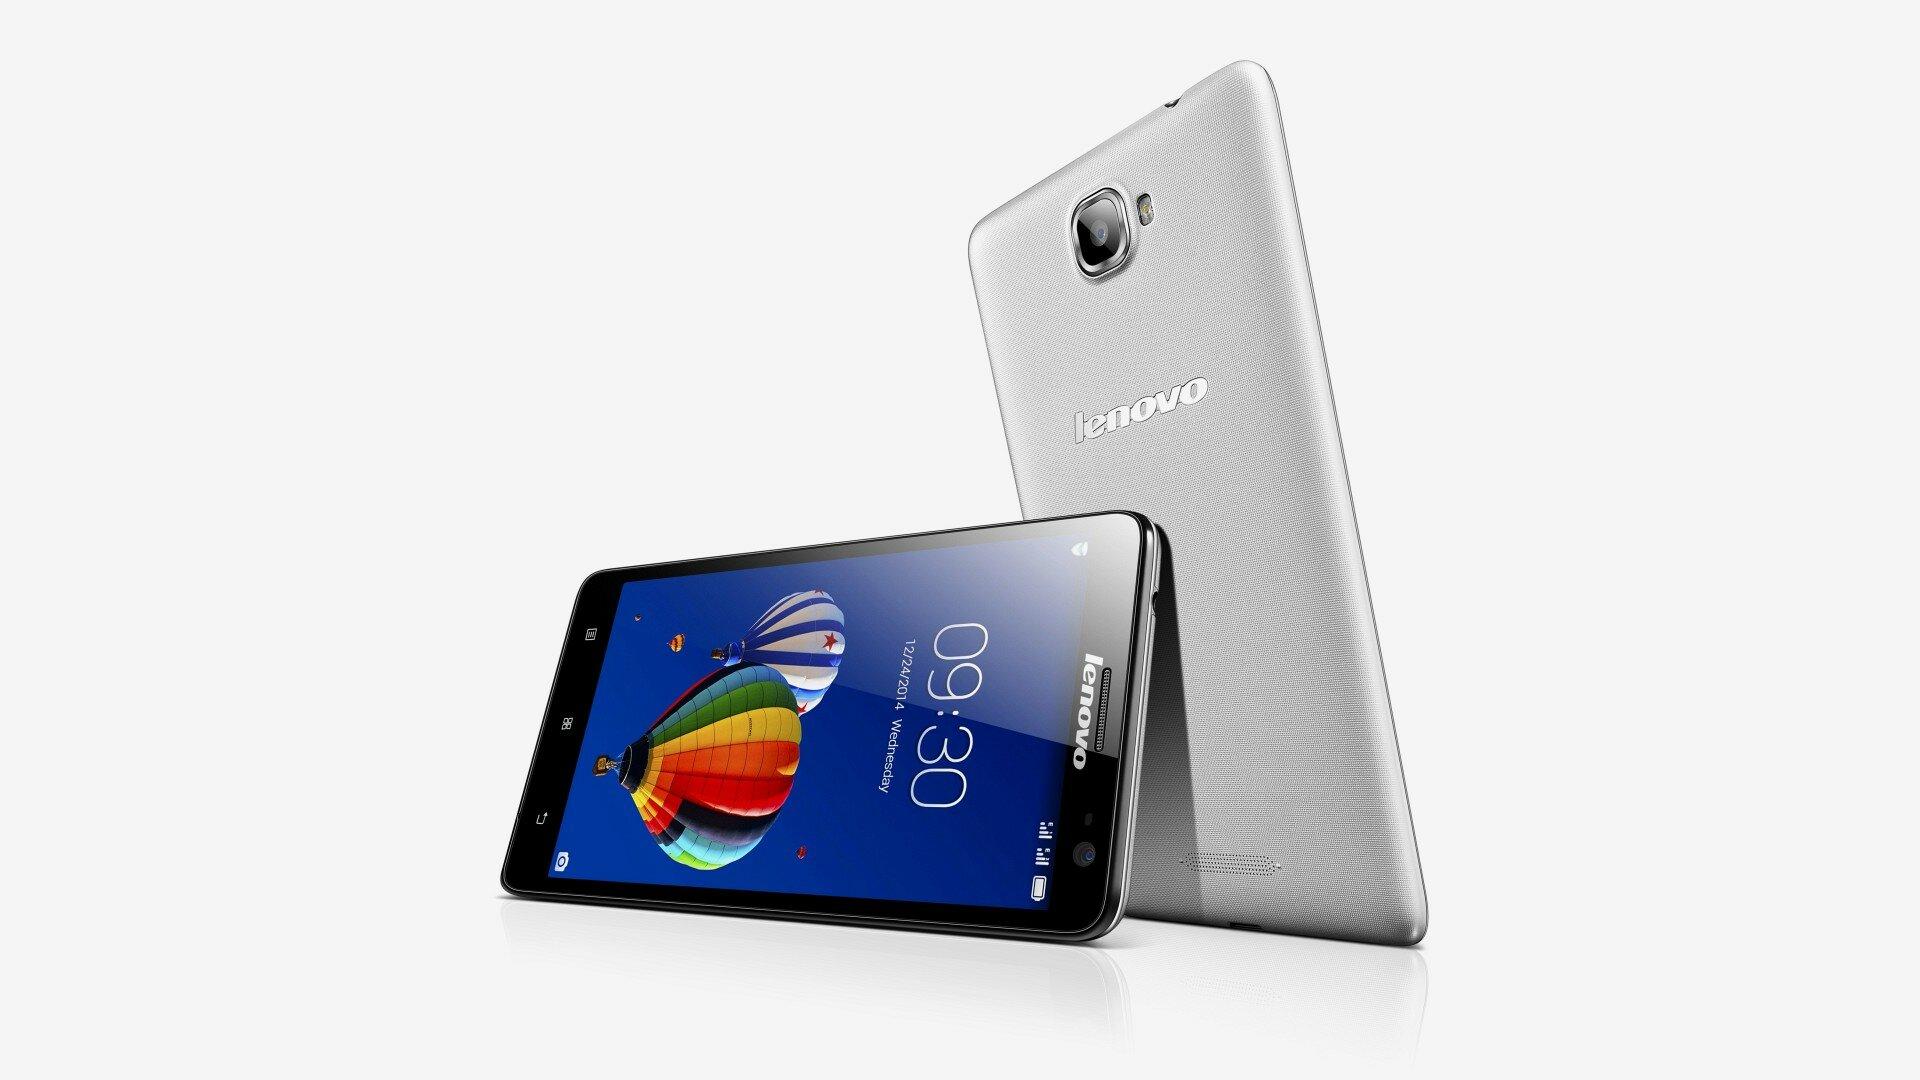 смартфон со средними характеристиками